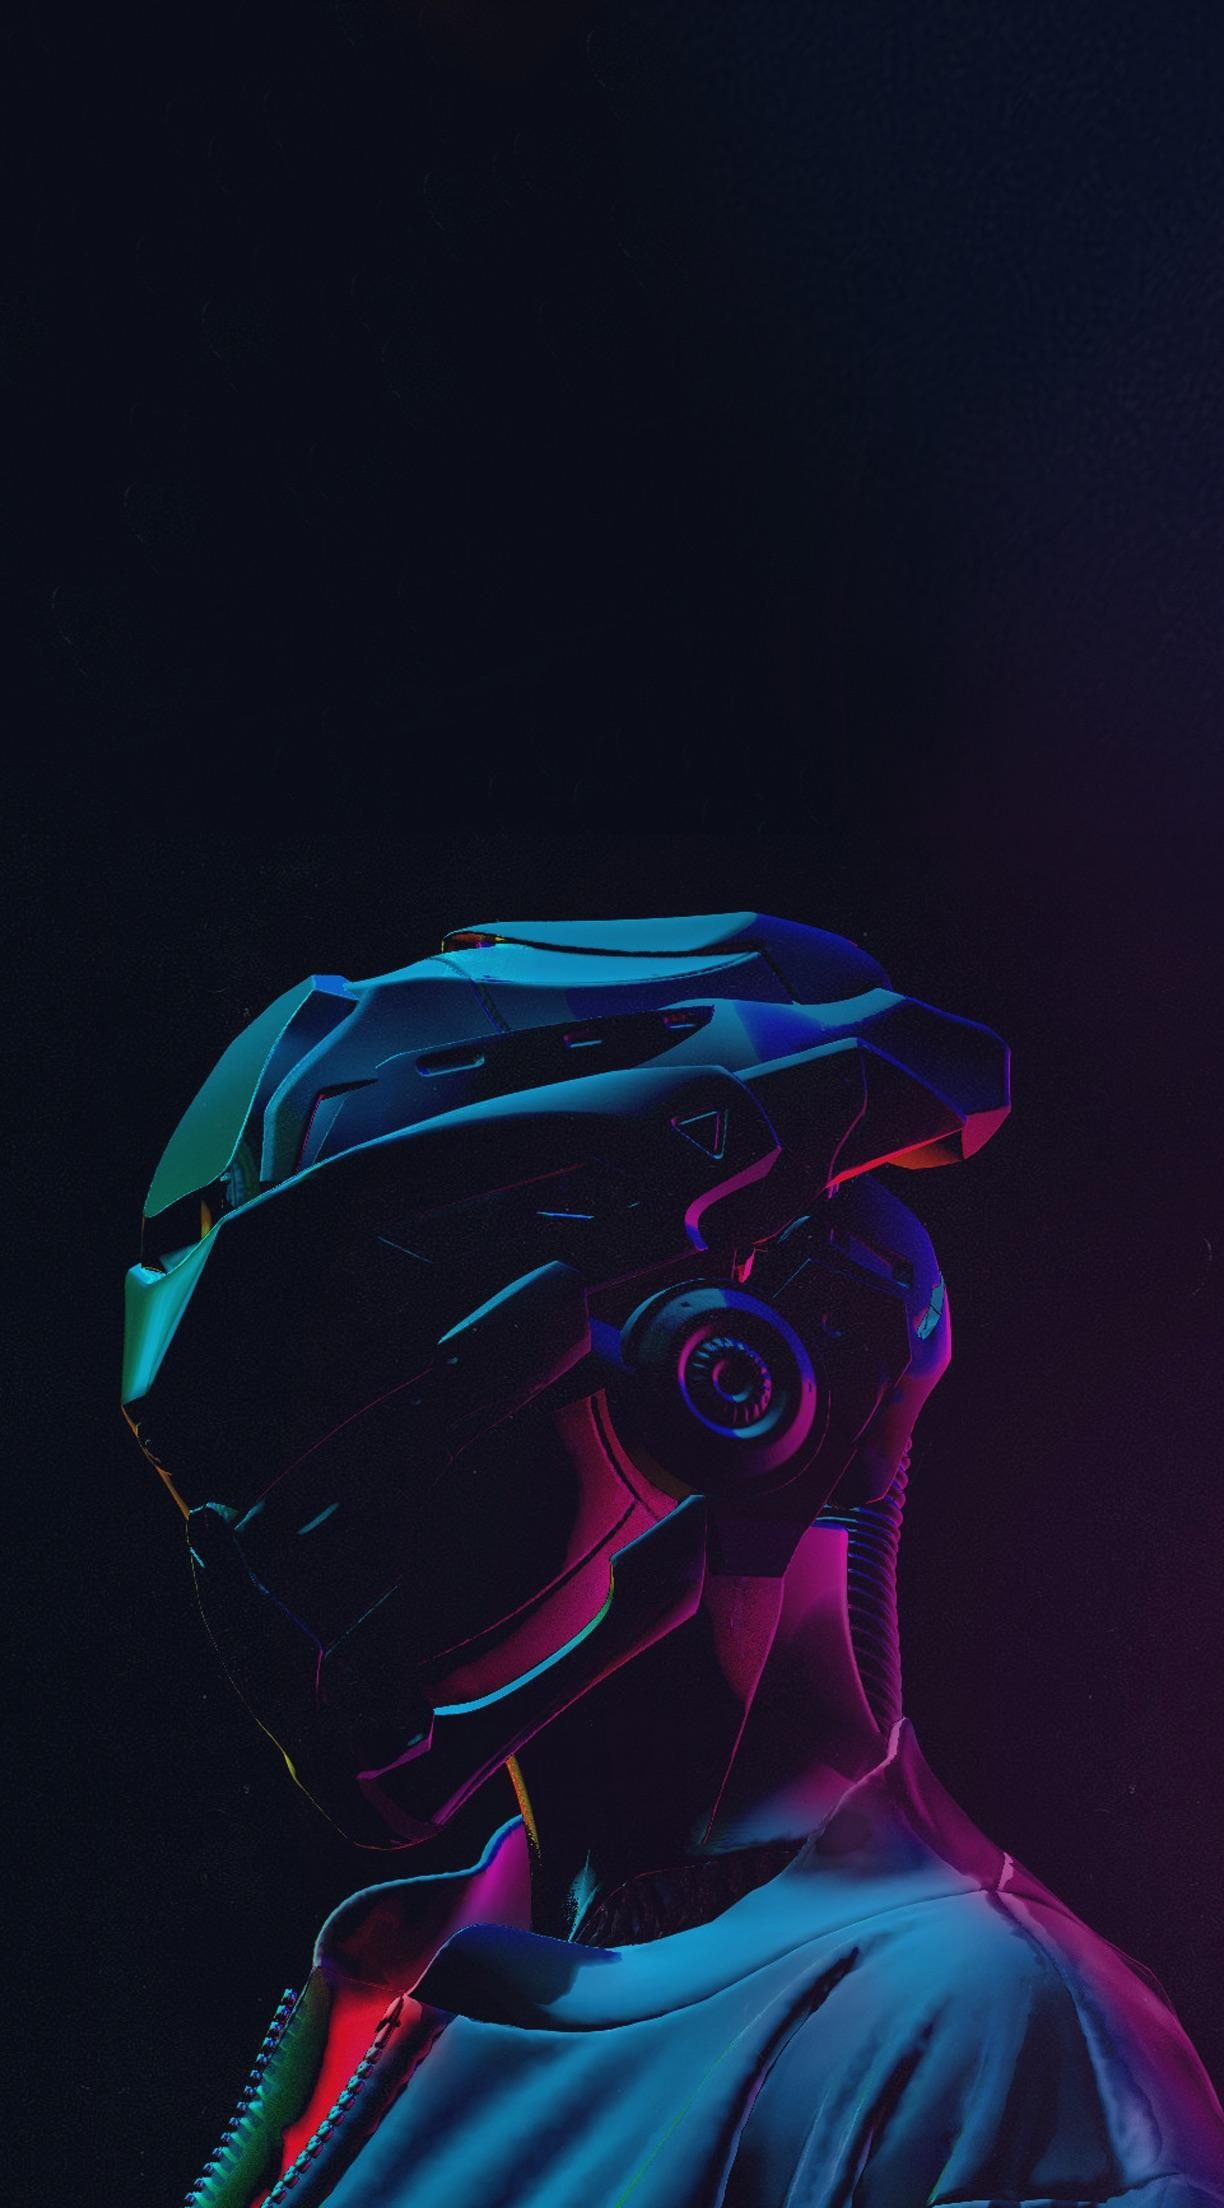 punk Cyberpunk style, Cyberpunk 2077, Cyberpunk art